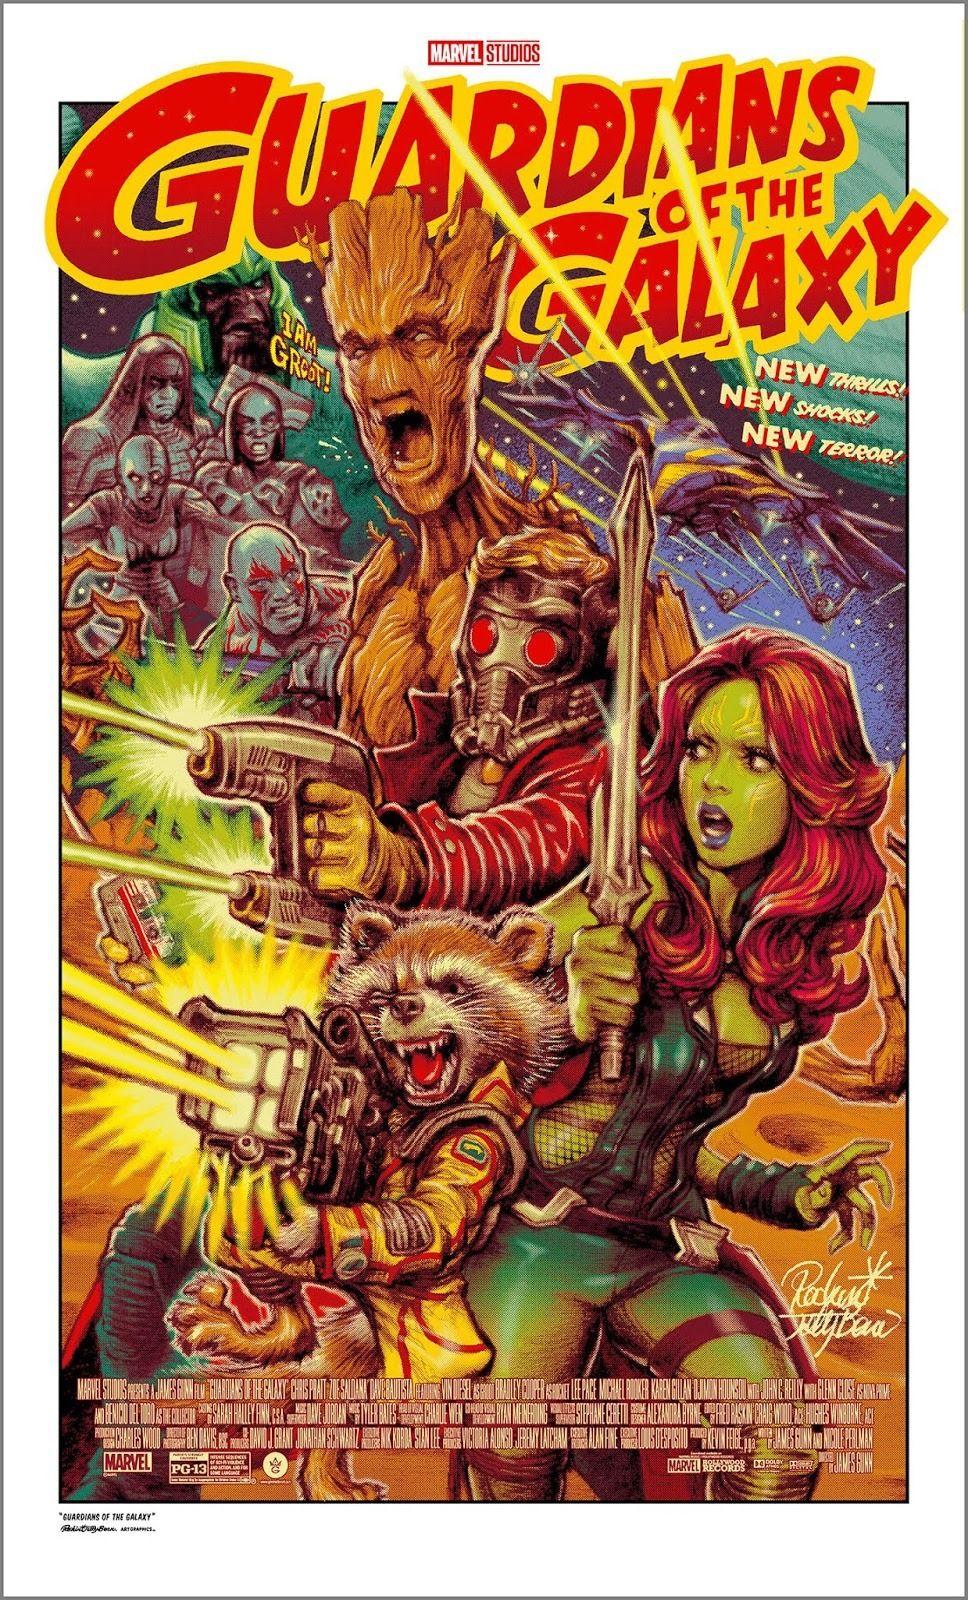 POSTER 11x16 the incredible hulk  comics marvel